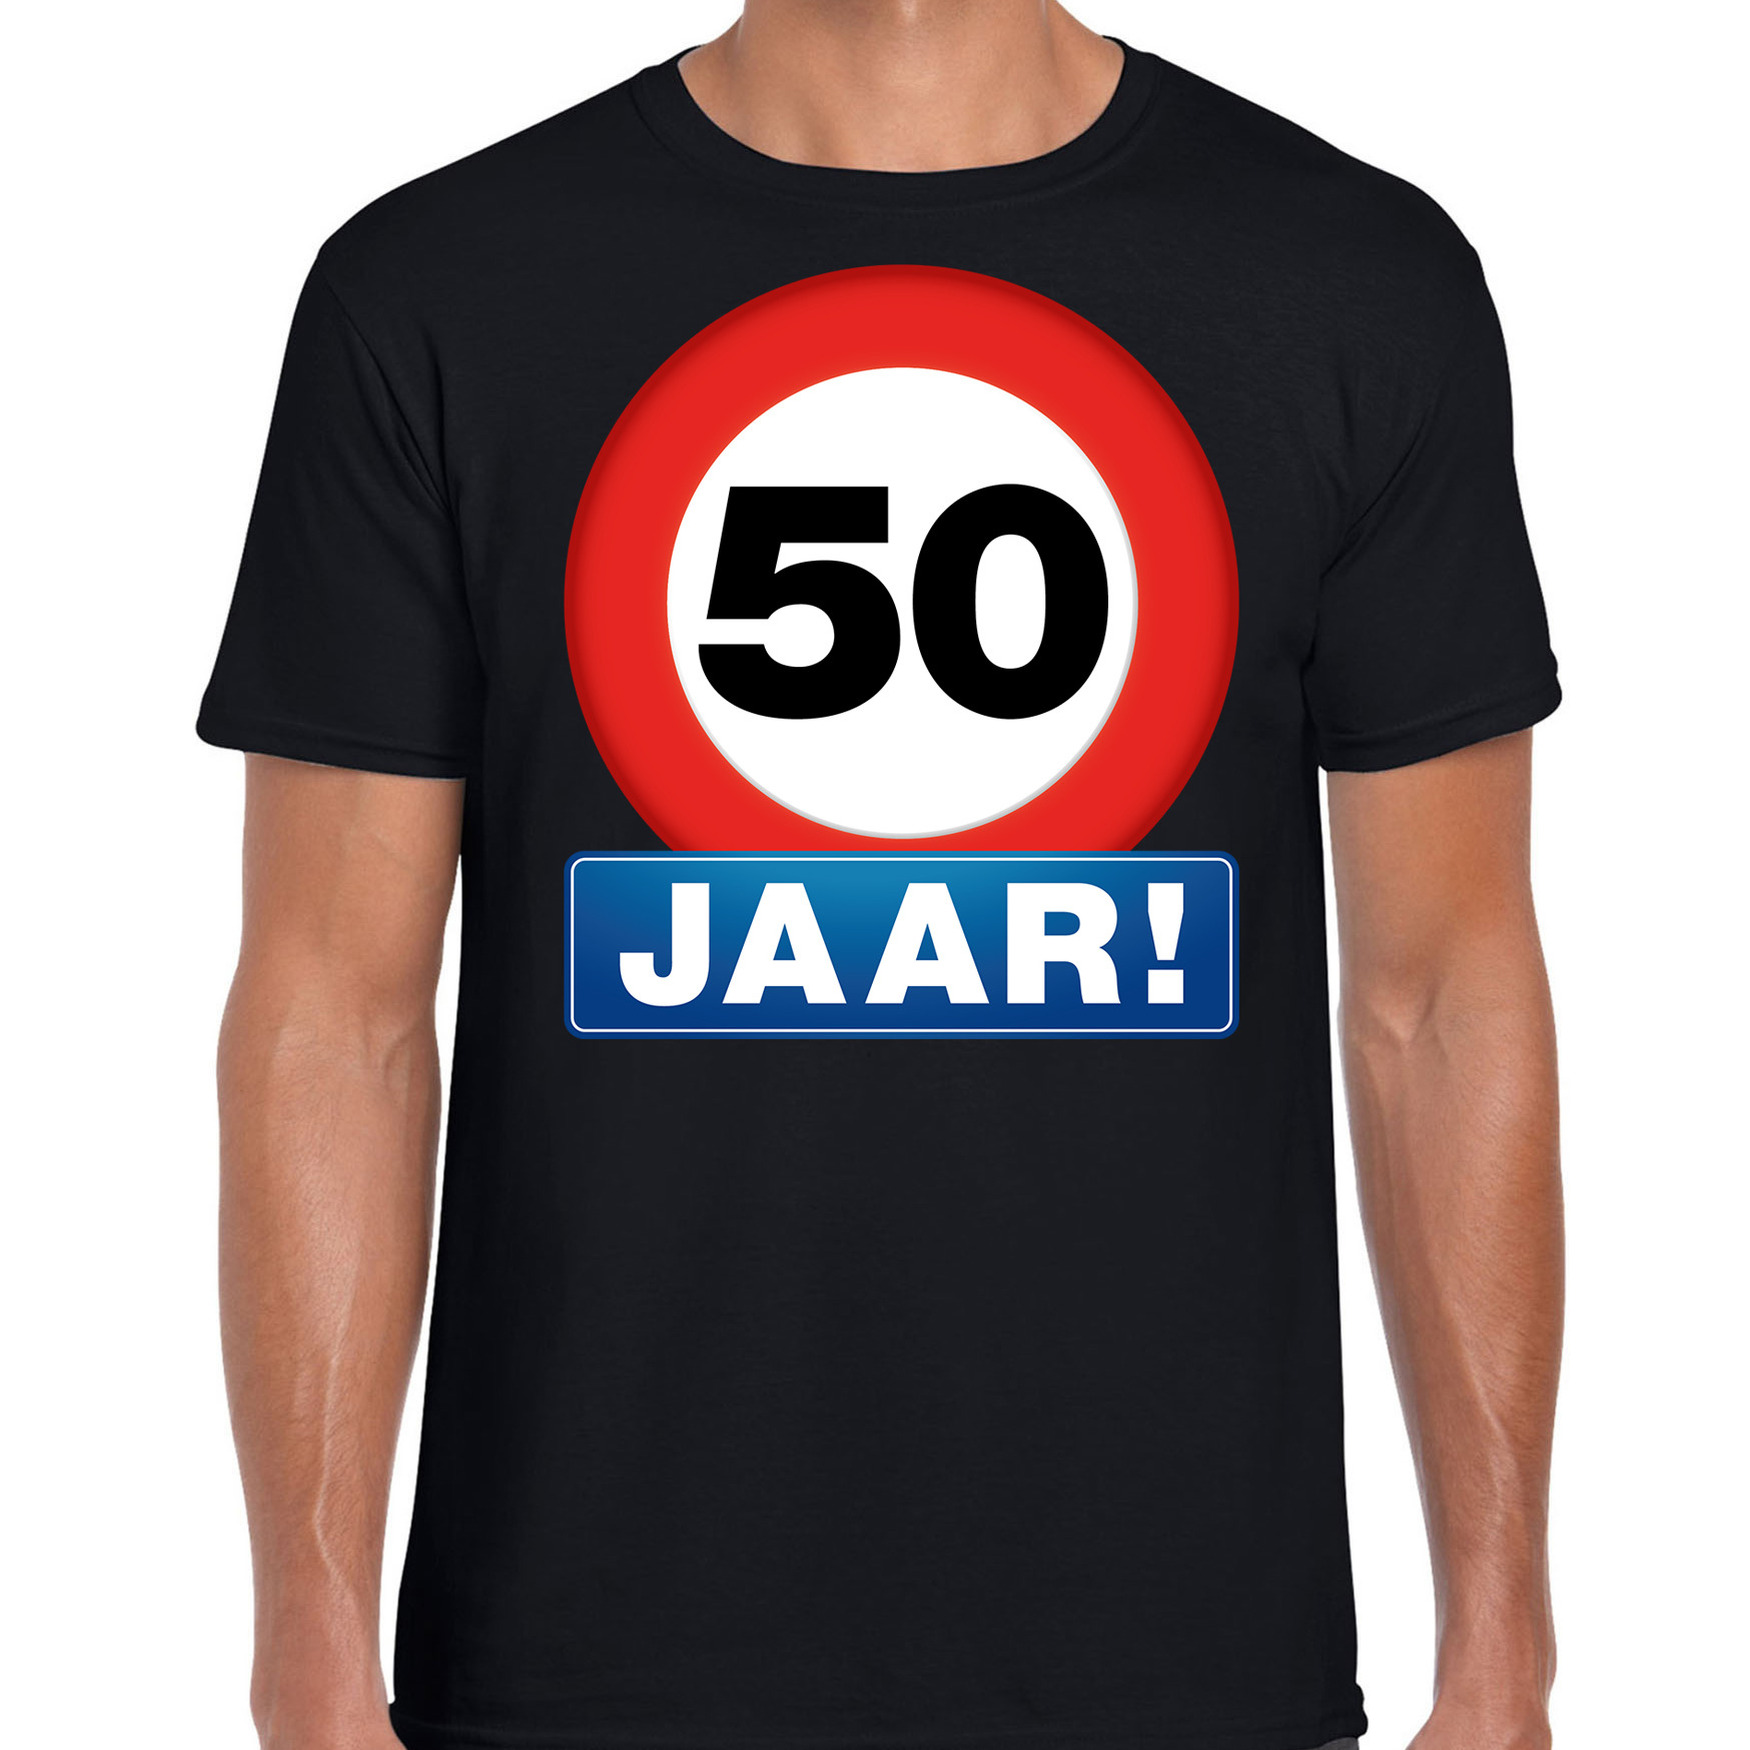 50e verjaardag stopbord shirt / kleding 50 jaar Abraham zwart voor heren L - Fee